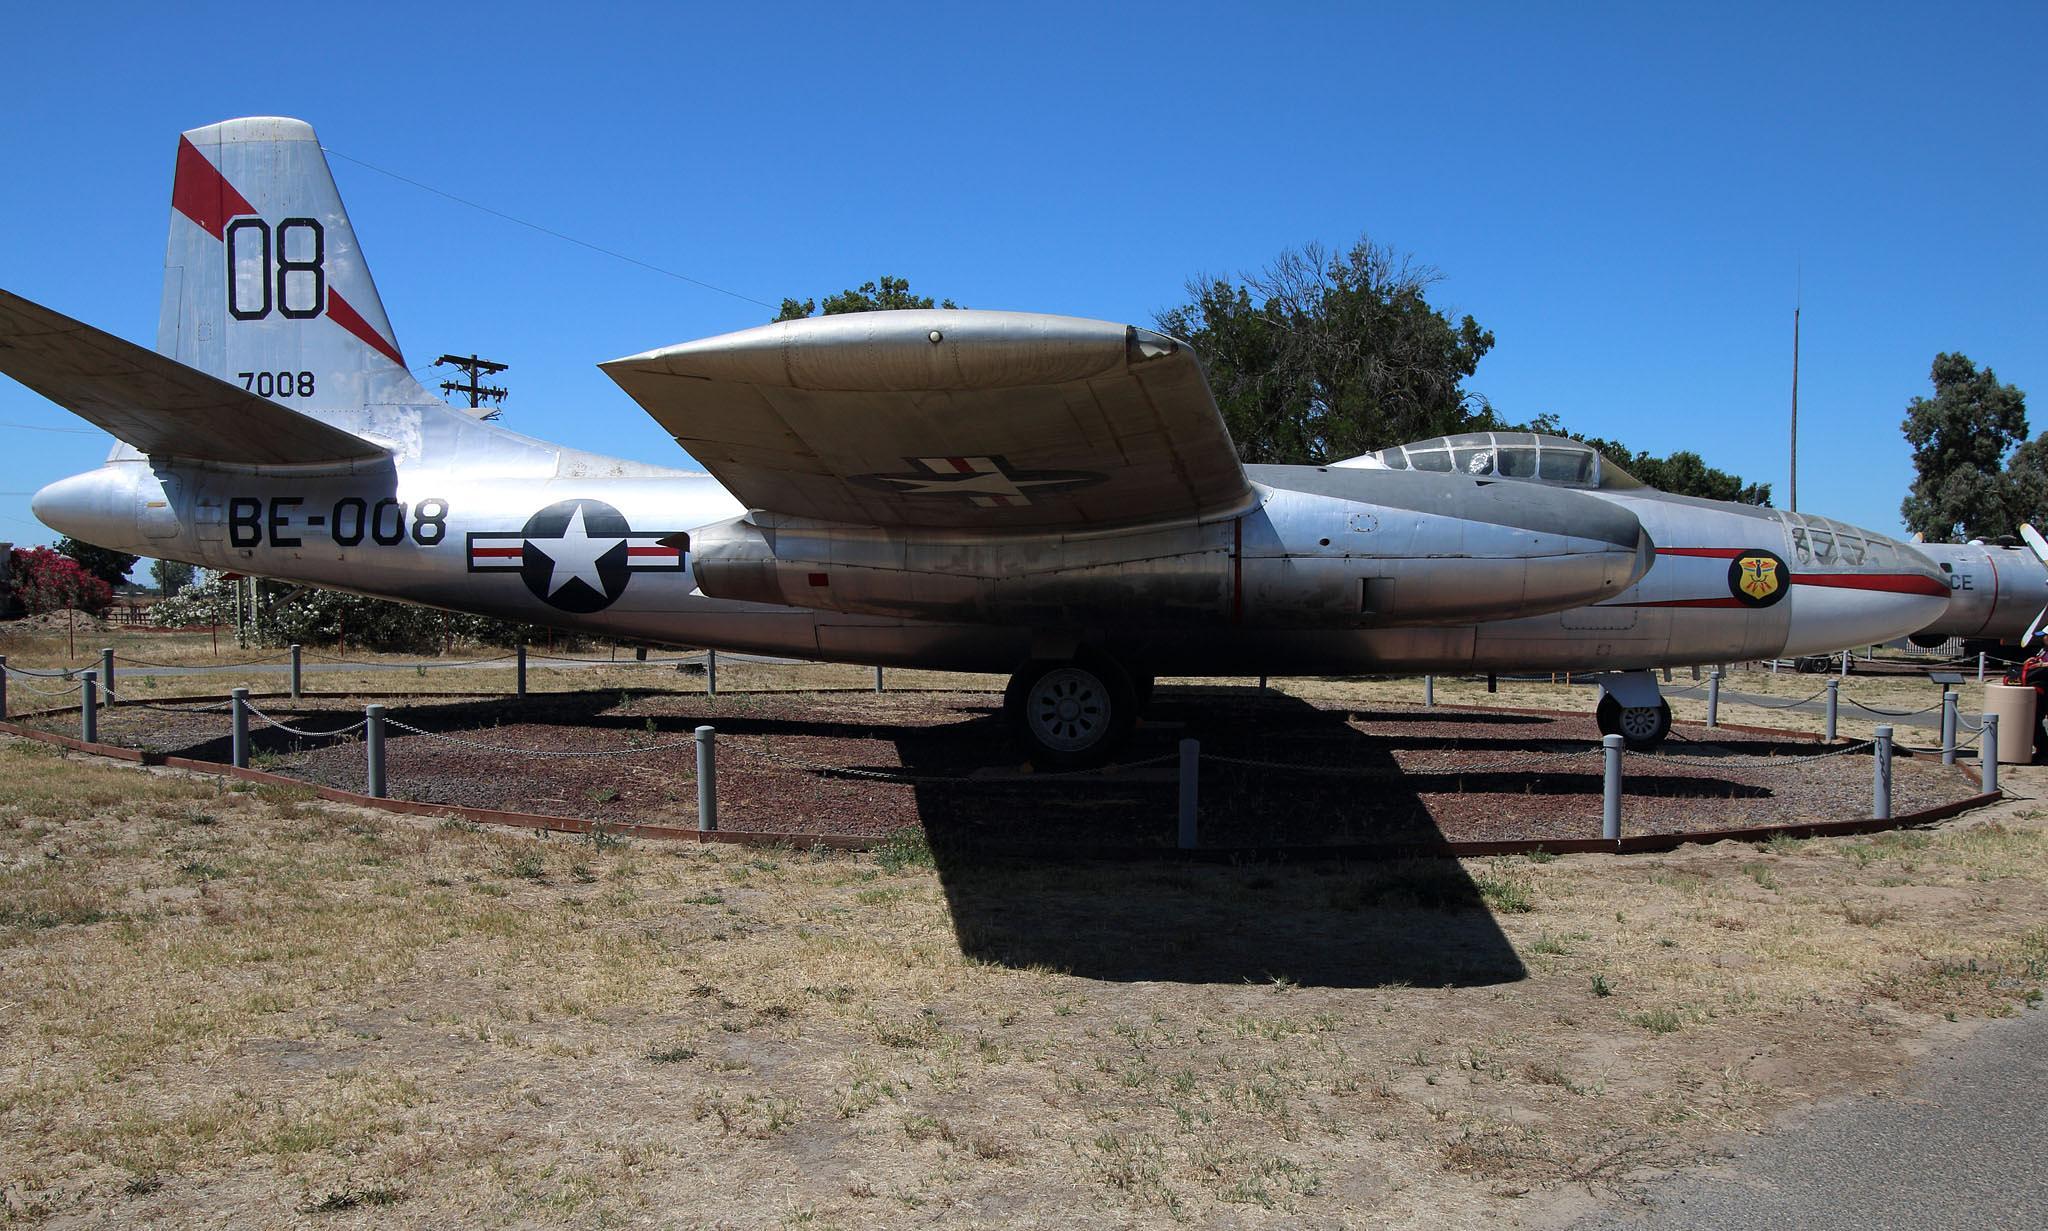 North American B-45 Tornado by Rita Simmonds